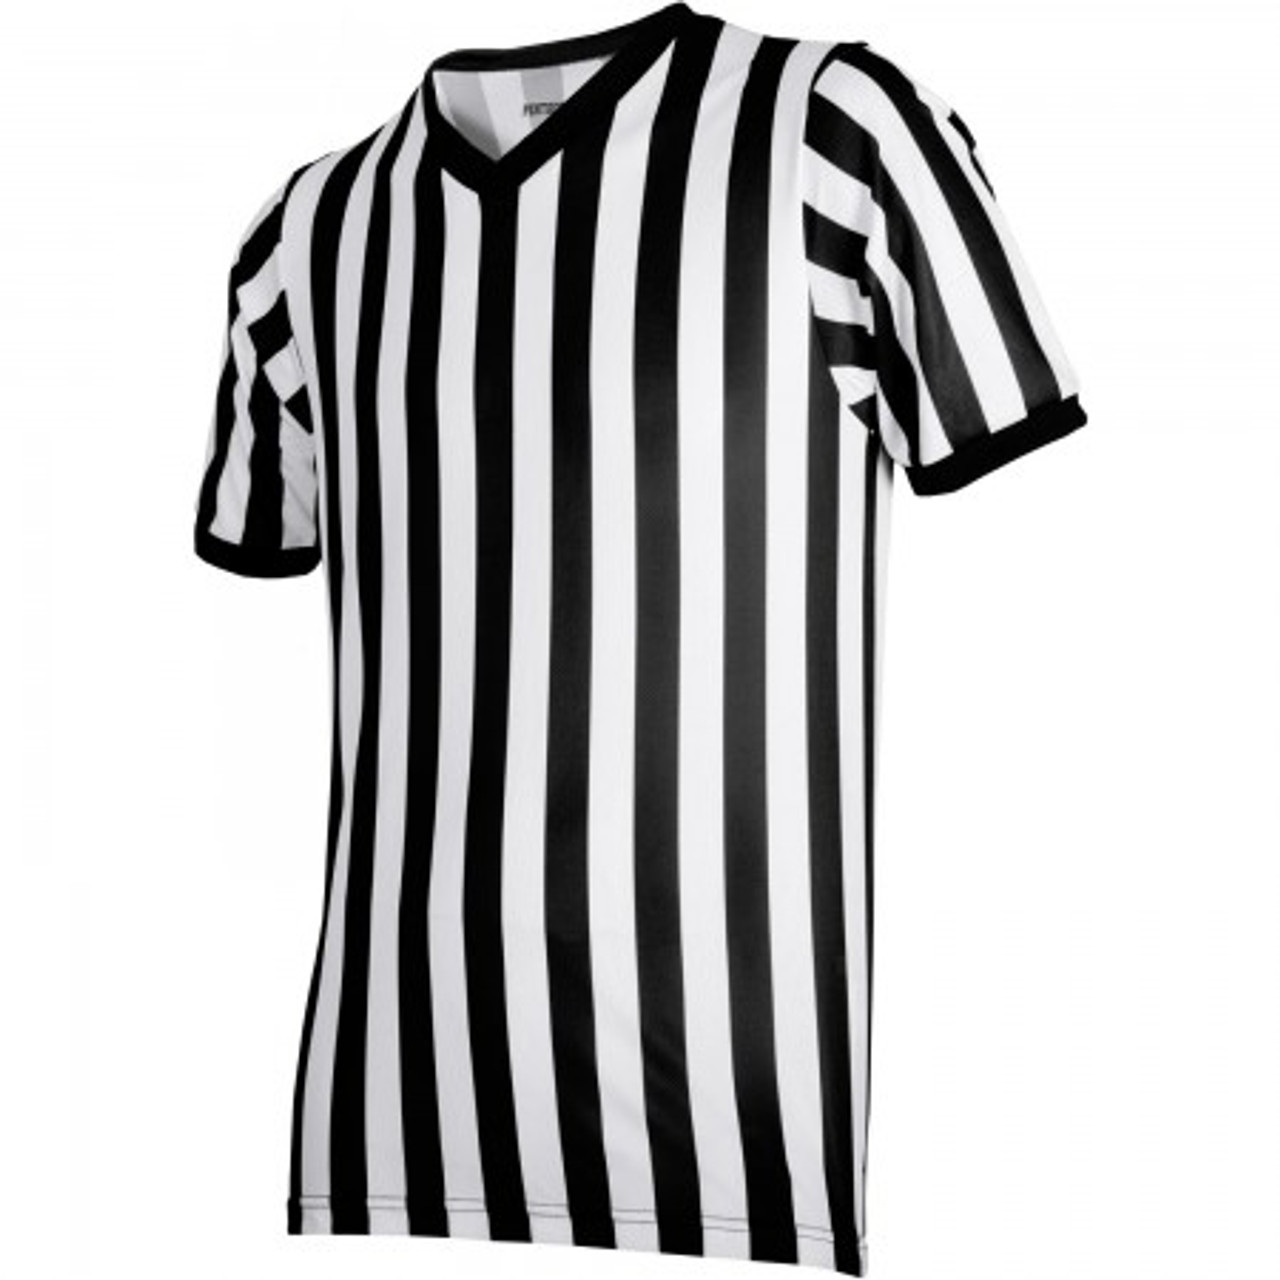 Honig's ProSoft Basketball Referee Shirt-Extra Tall